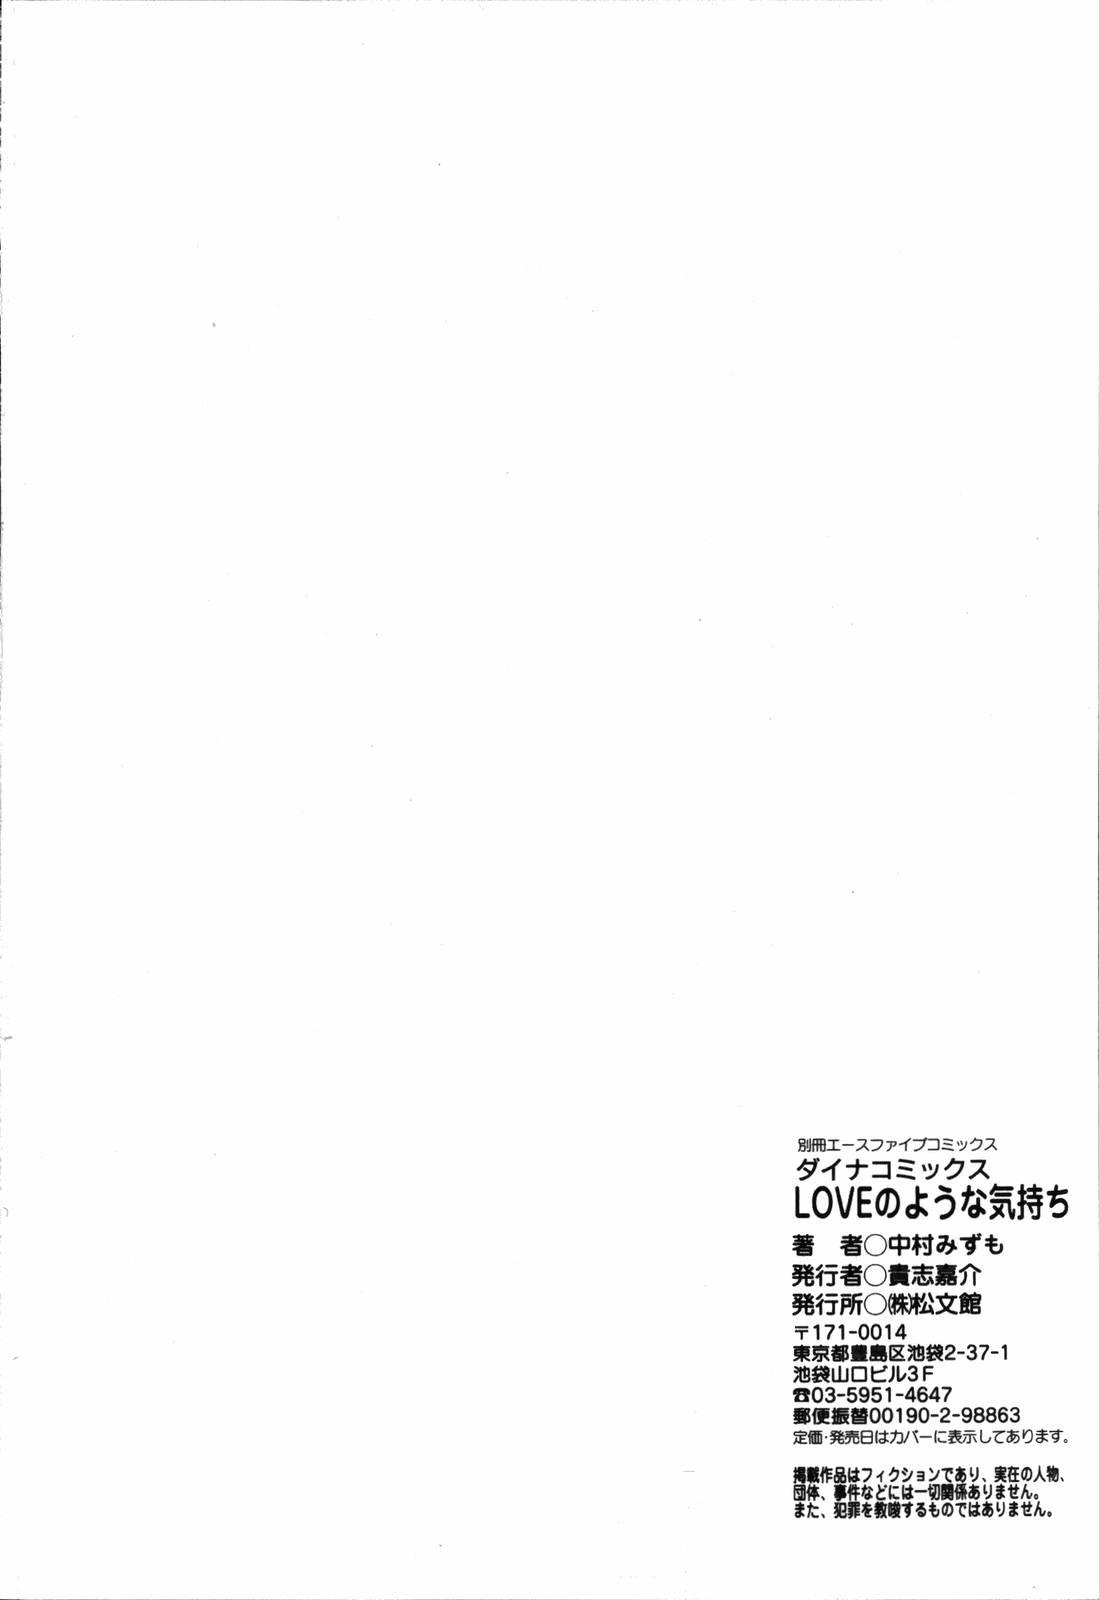 LOVE no You na Kimochi - The Feeling Like Love 165